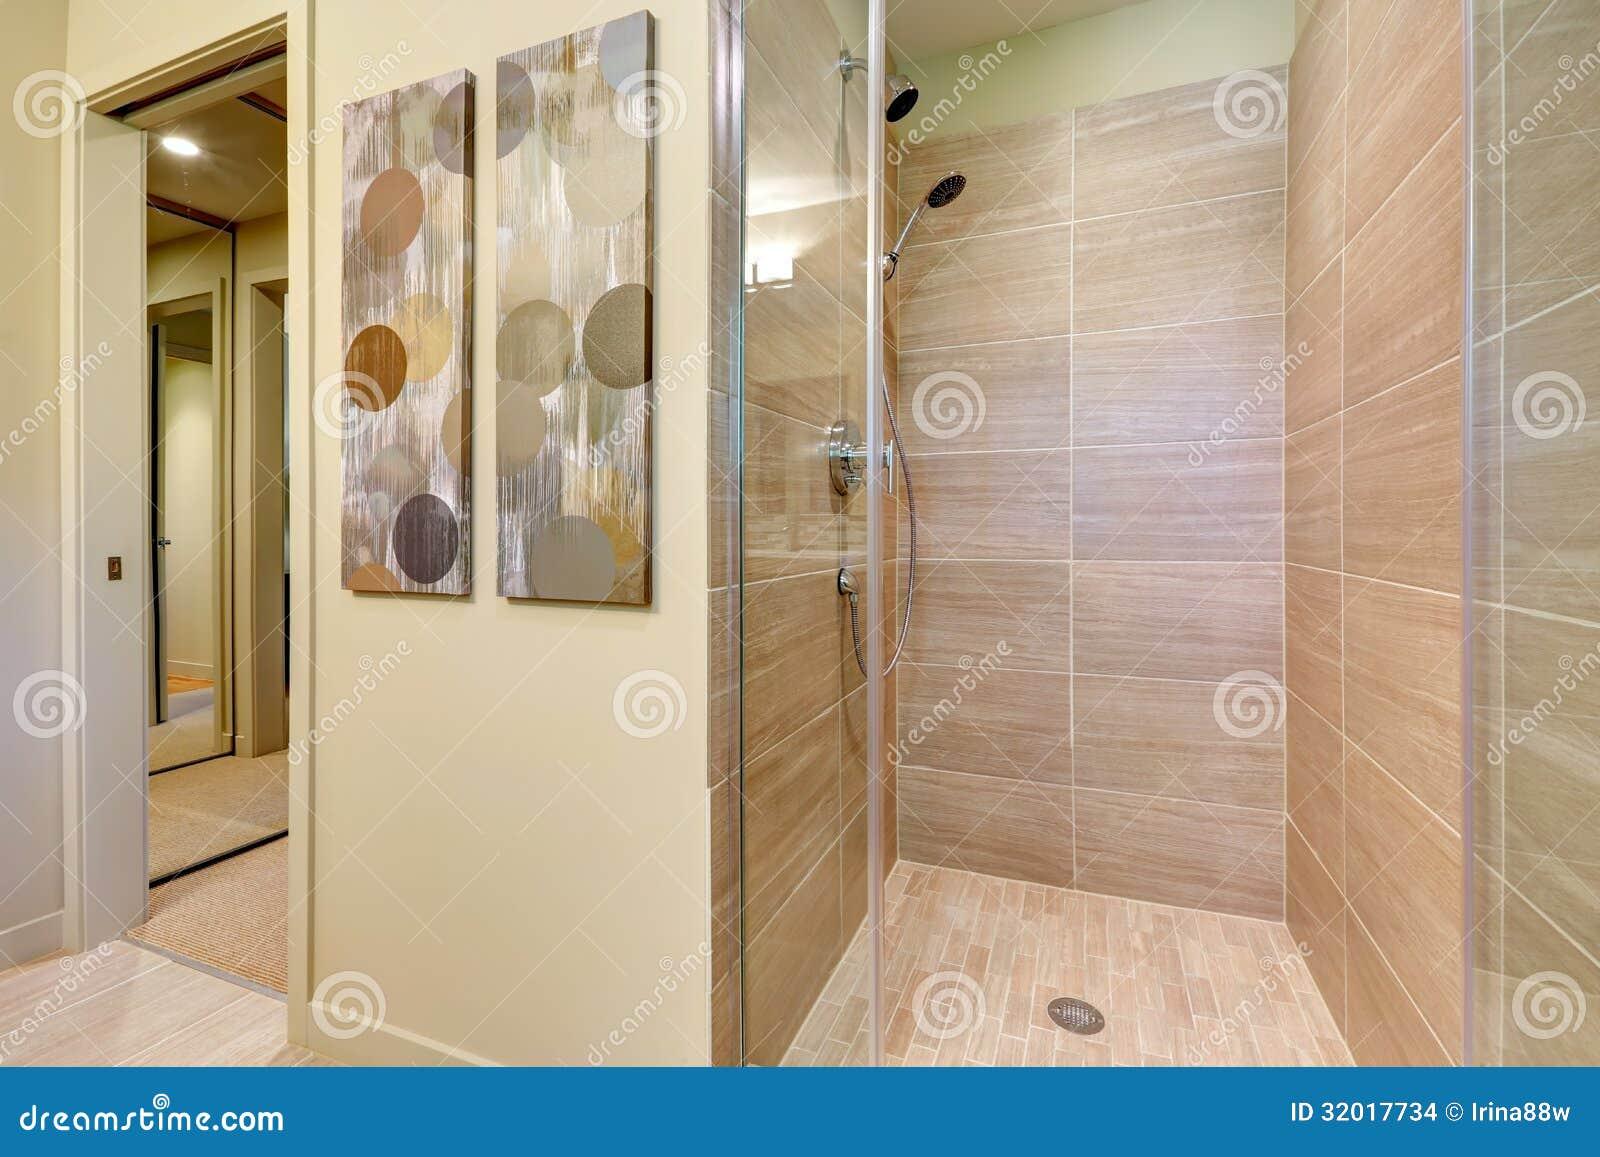 Puertas Para Baño Modernas:Colors for Beige Bathroom Tile Shower